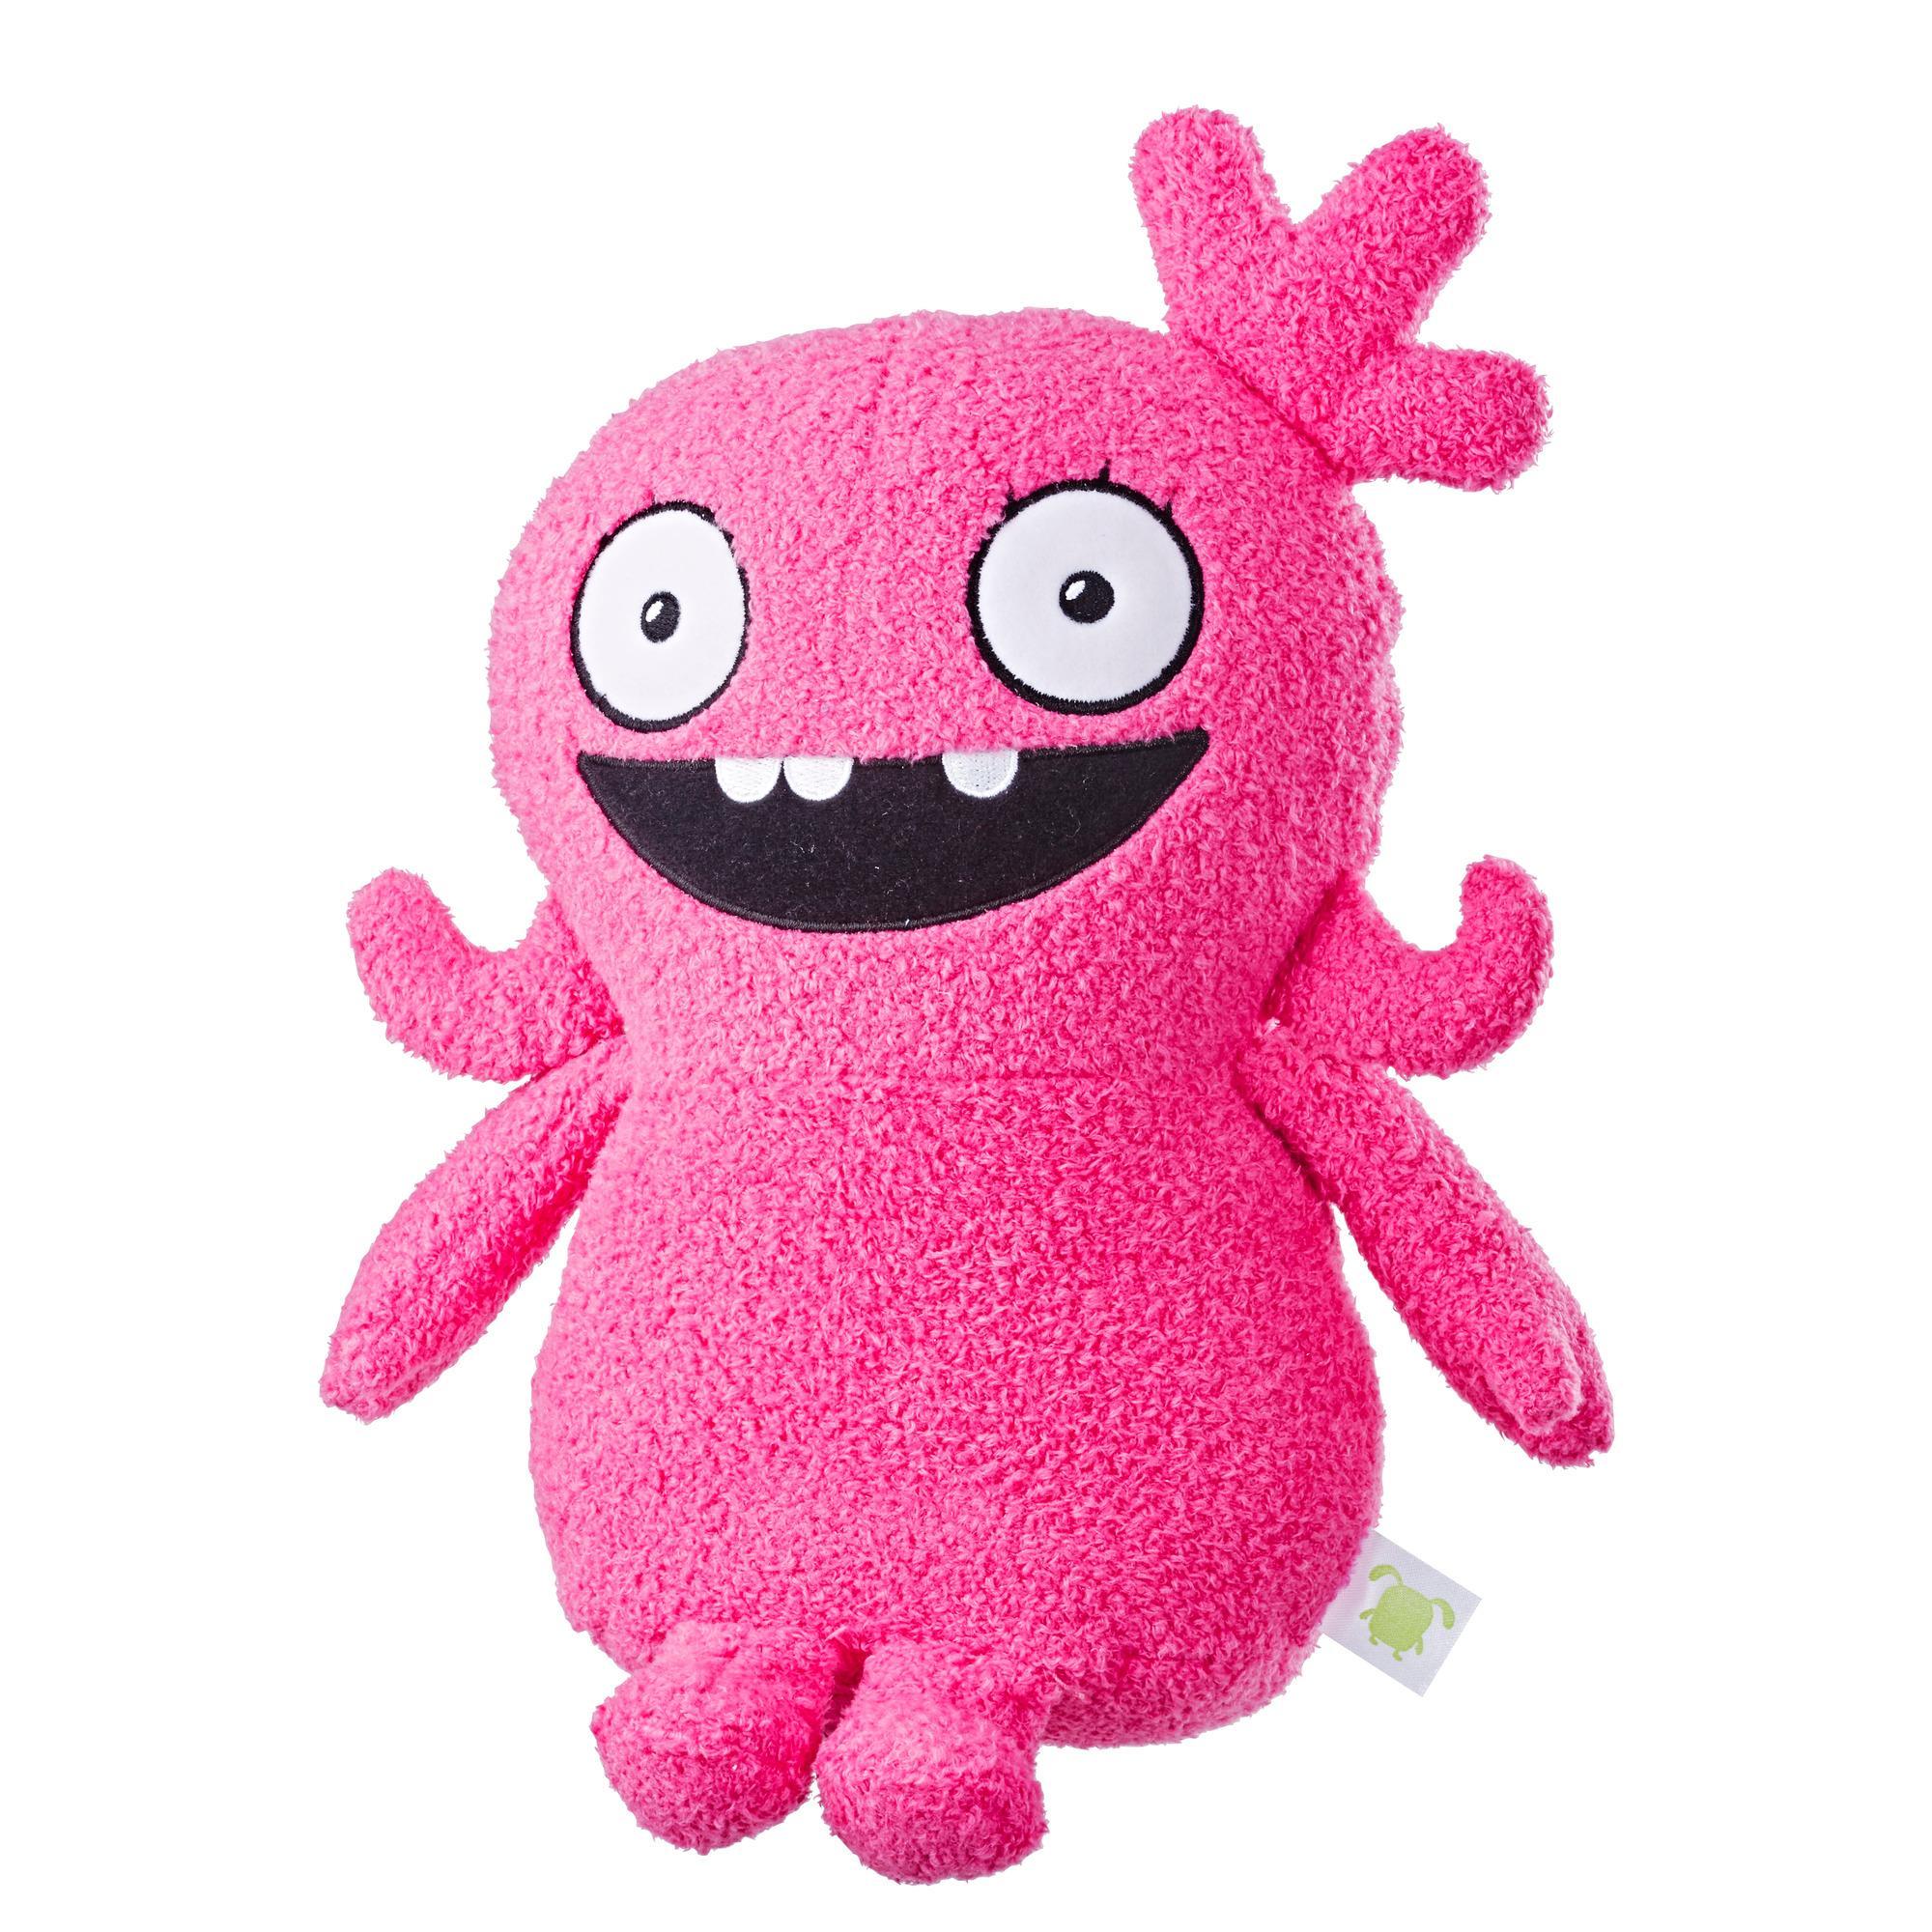 UglyDolls Feature Sounds Moxy, Stuffed Plush Toy that Talks, 28 cm. tall